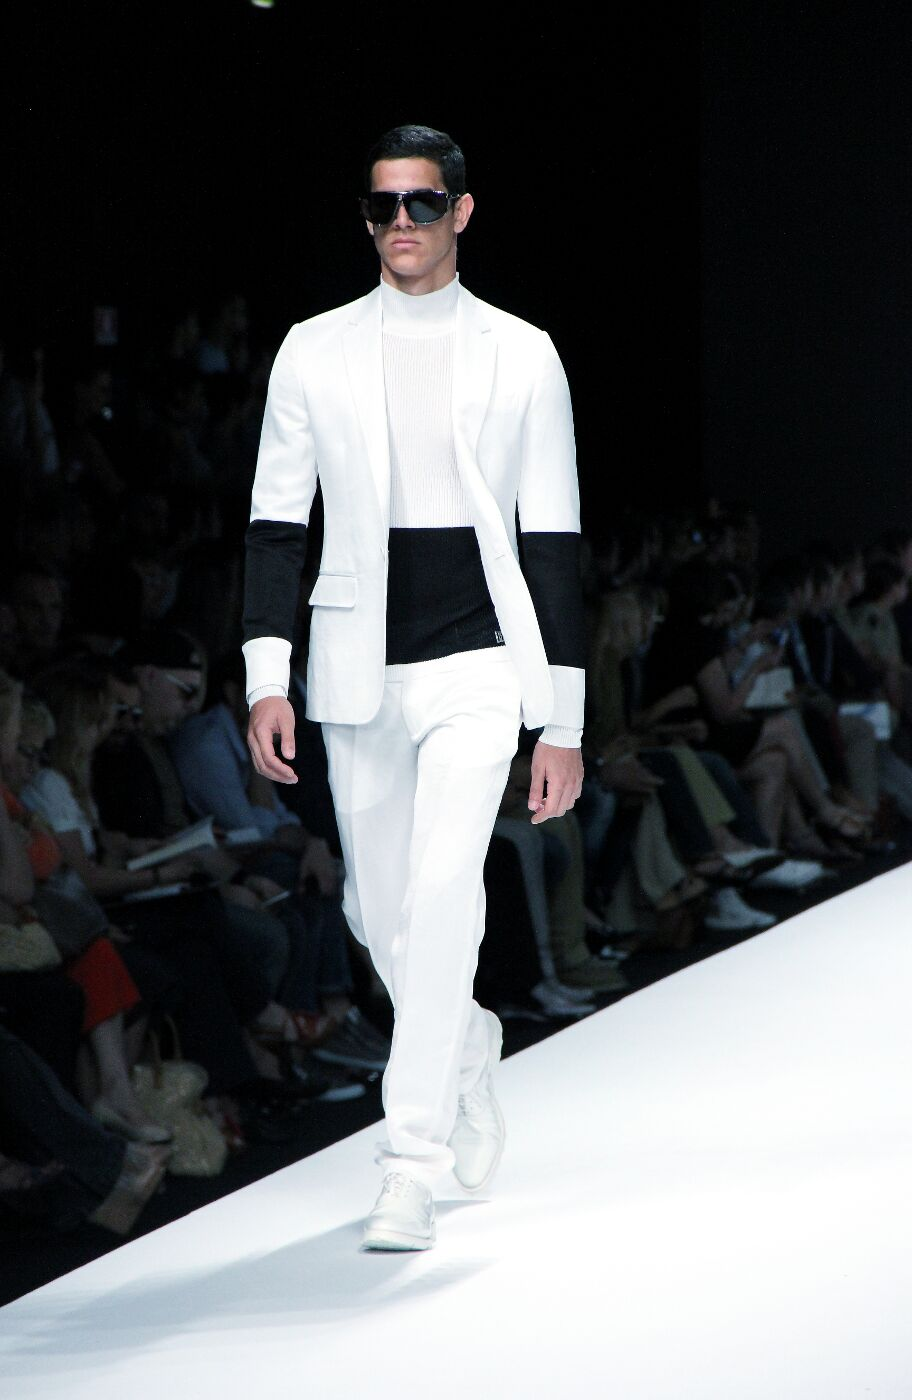 dirk-bikkembergs-sport-couture-spring-summer-2012-men-collection-milano-fashion-week-2012-dirk-bikkembergs-sport-couture-primavera-estate-catwalk-2012